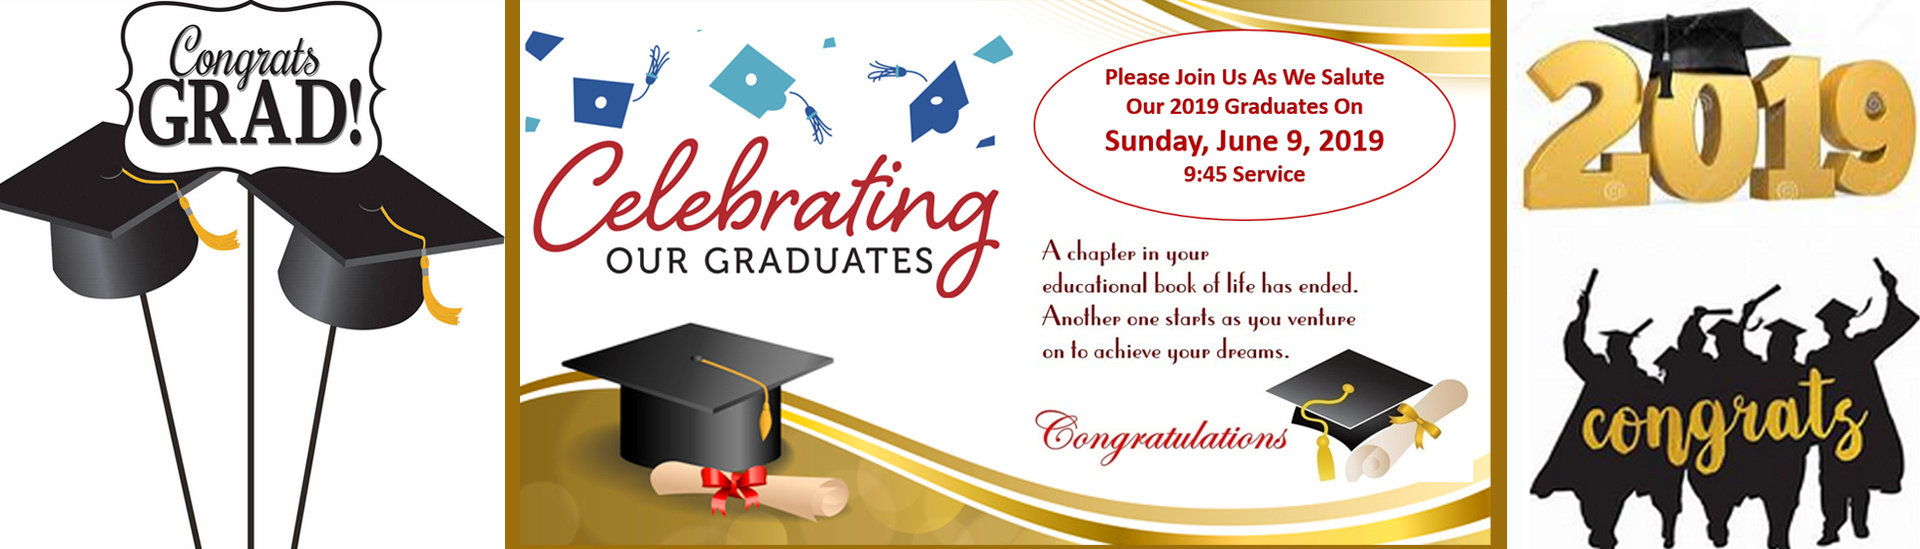 https://0201.nccdn.net/4_2/000/000/00d/f43/graduates-1920x549.jpg